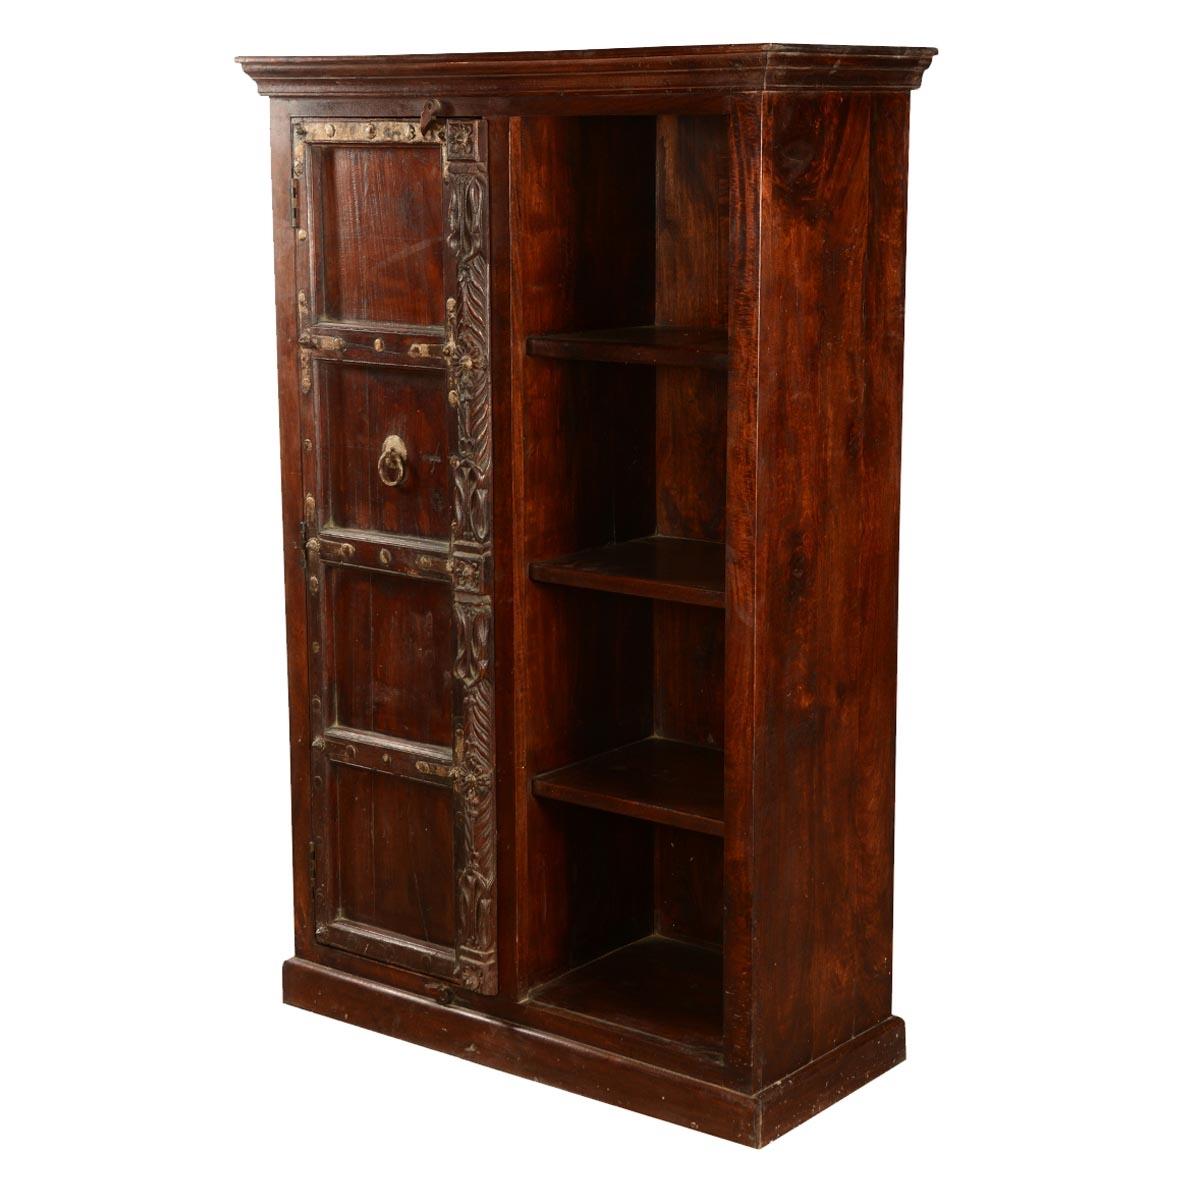 Classic Reclaimed Wood Wardrobe Bookcase Cabinet Regarding Classic Bookcase (#8 of 15)